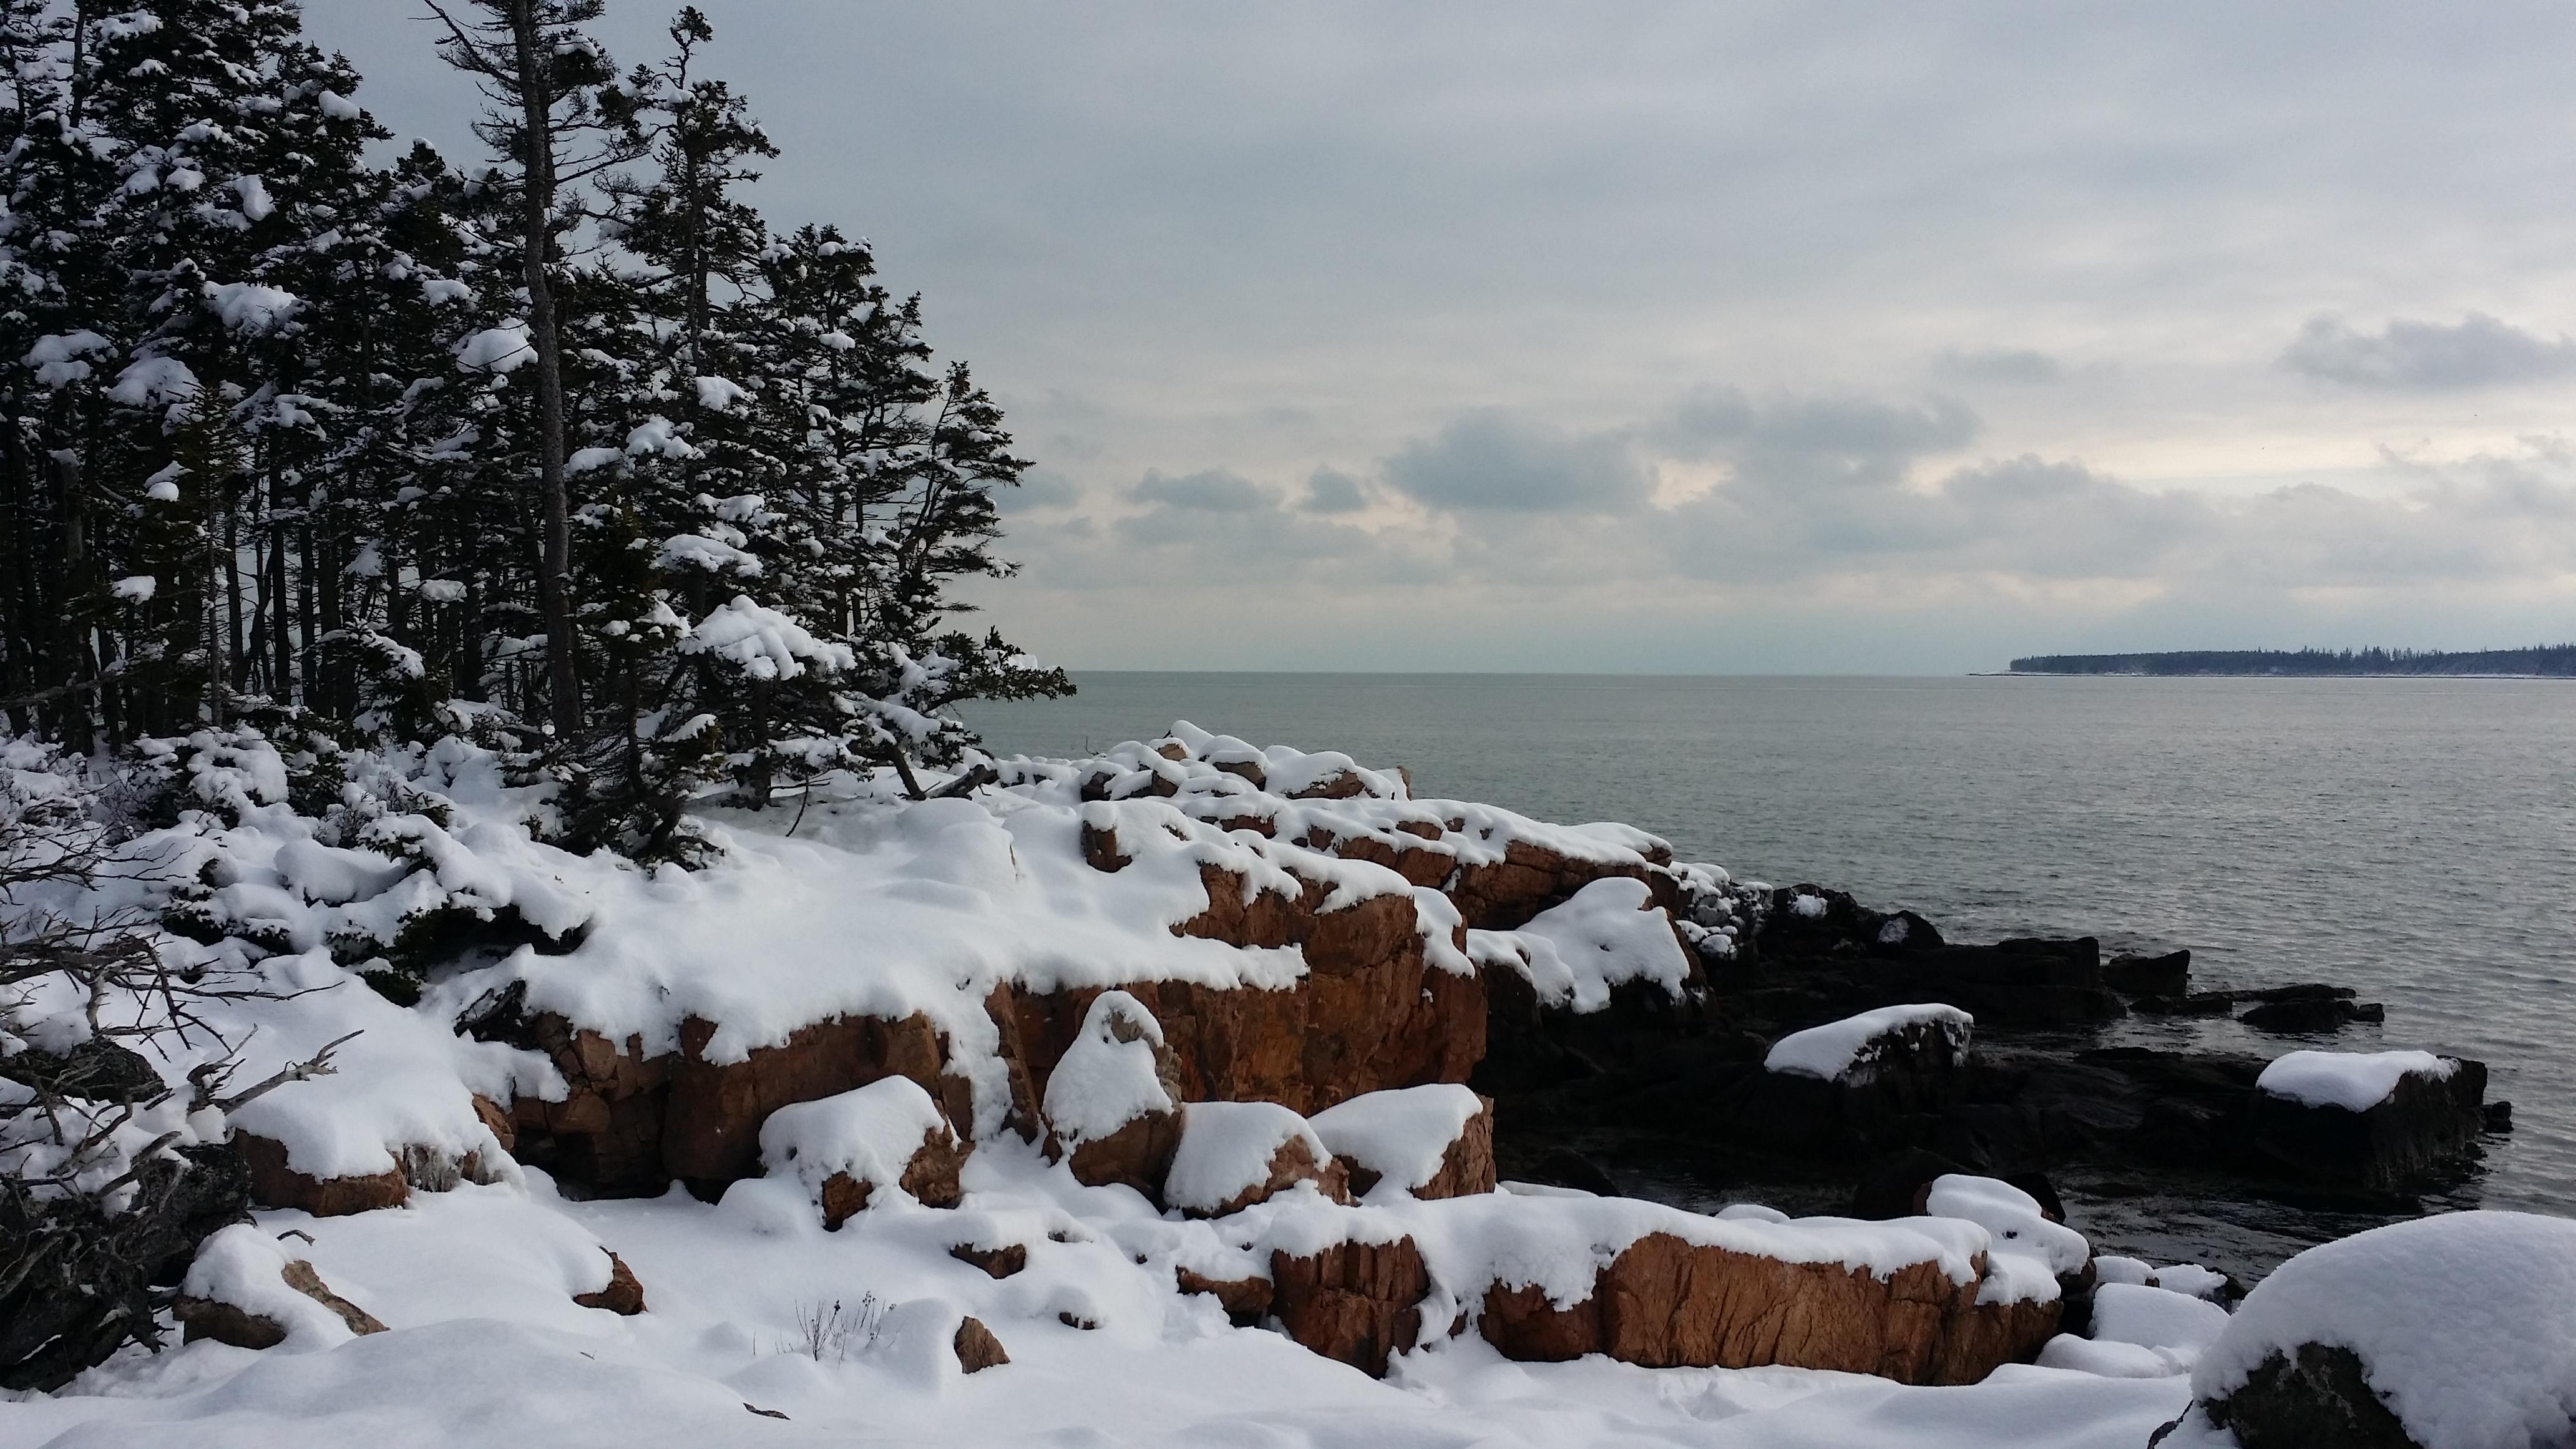 Coast Acadia's Maine Year-round Hiking Harbor For Ship Ideal